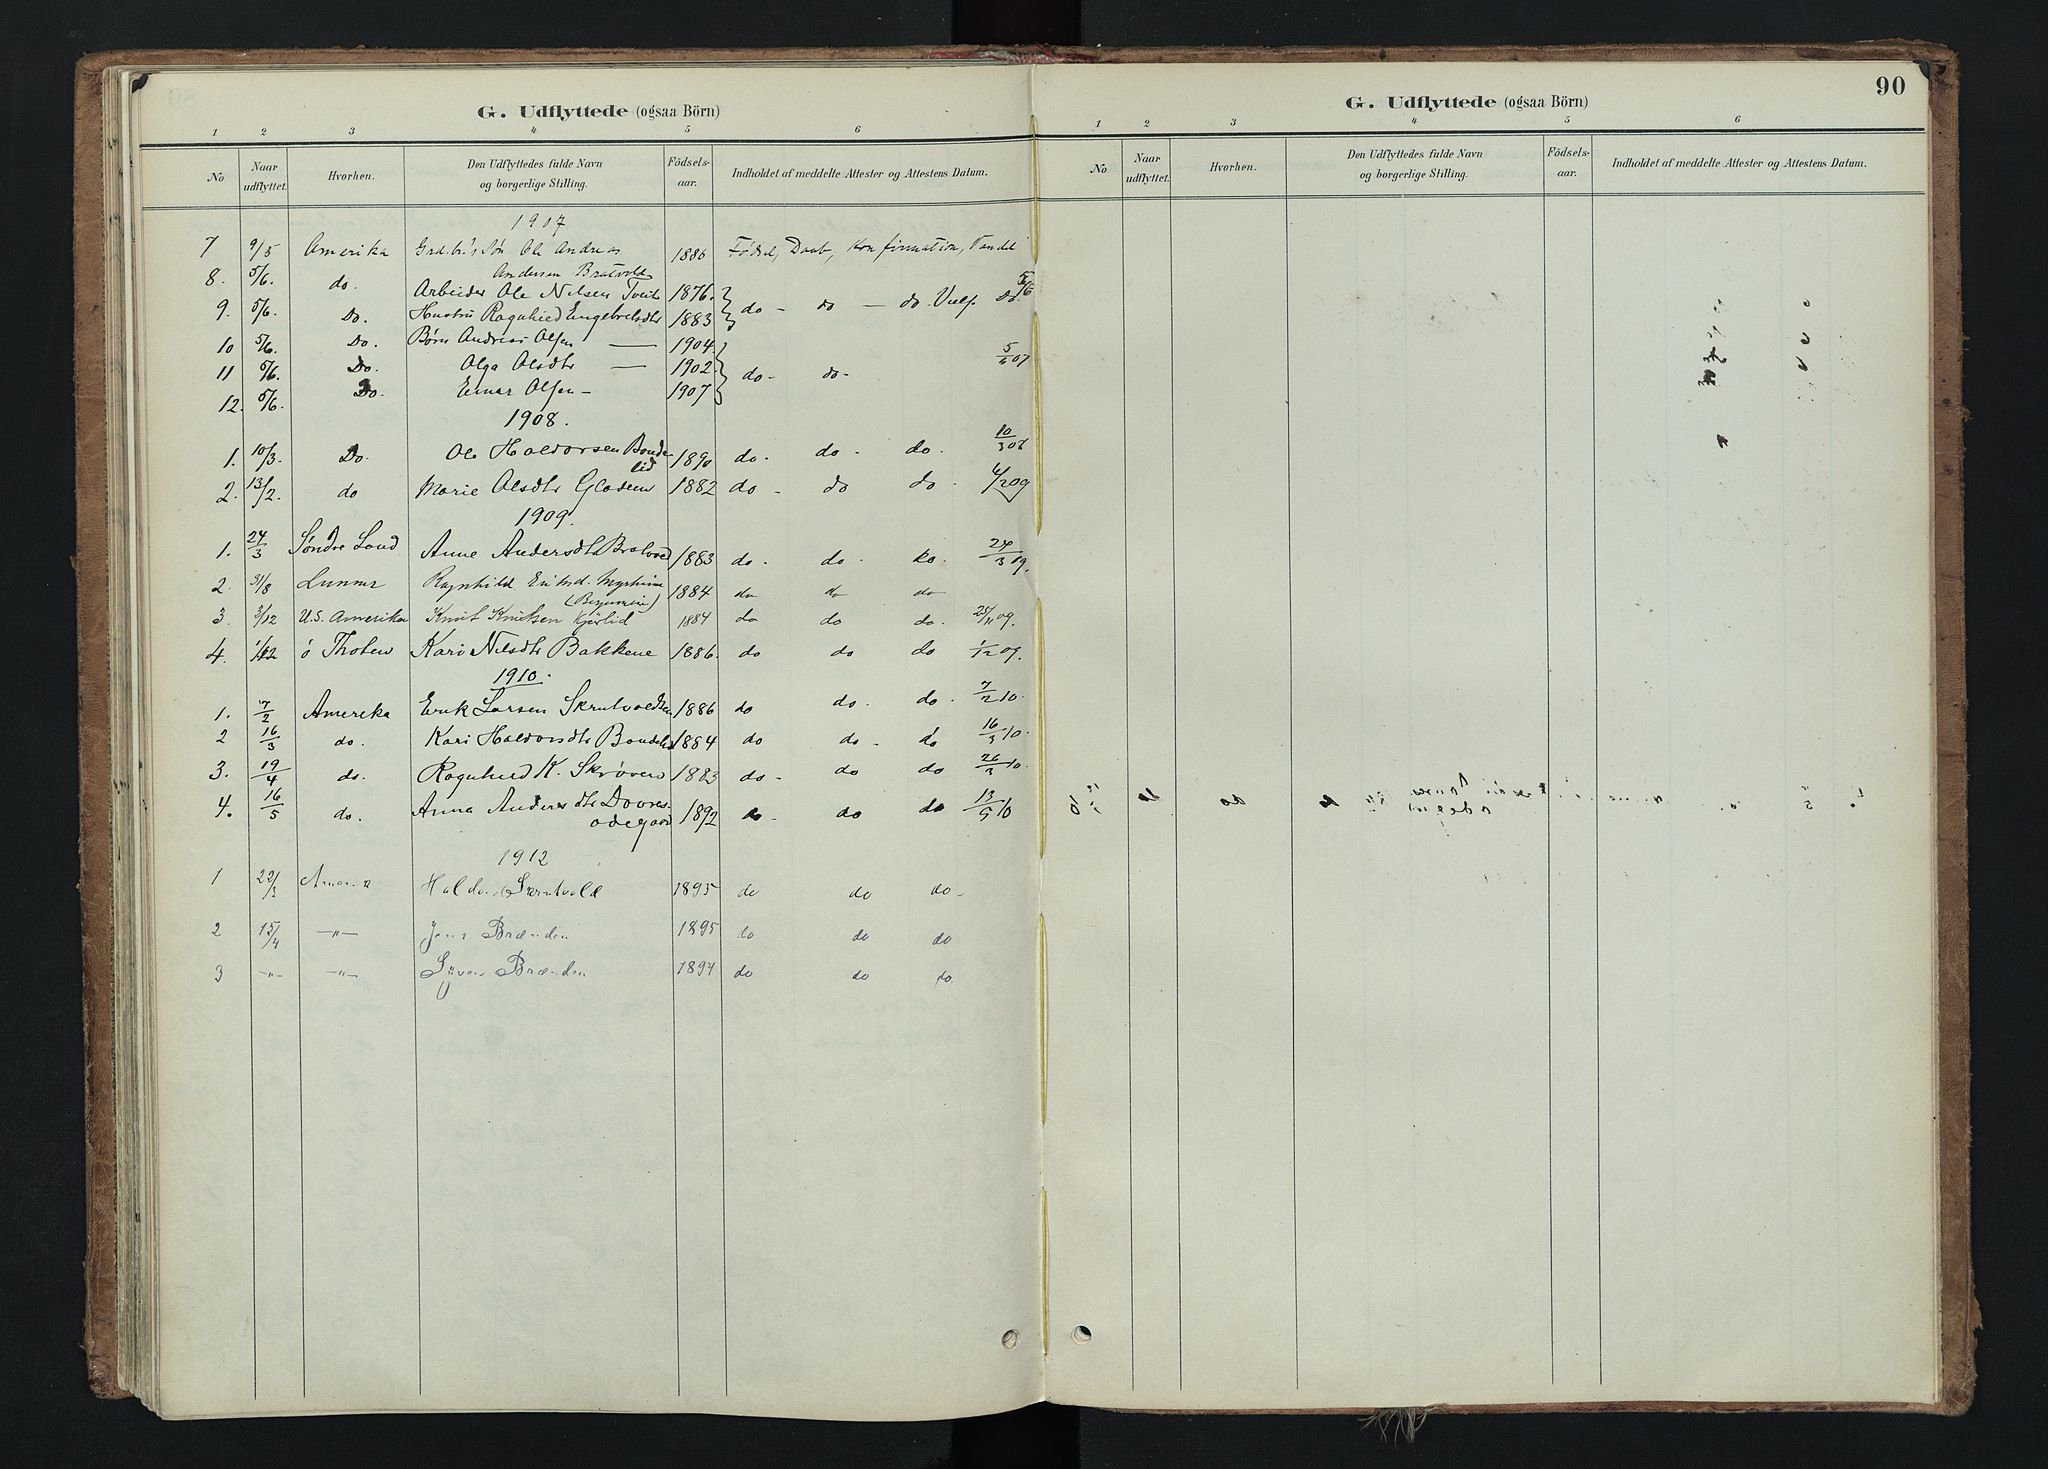 SAH, Nord-Aurdal prestekontor, Ministerialbok nr. 15, 1896-1914, s. 90